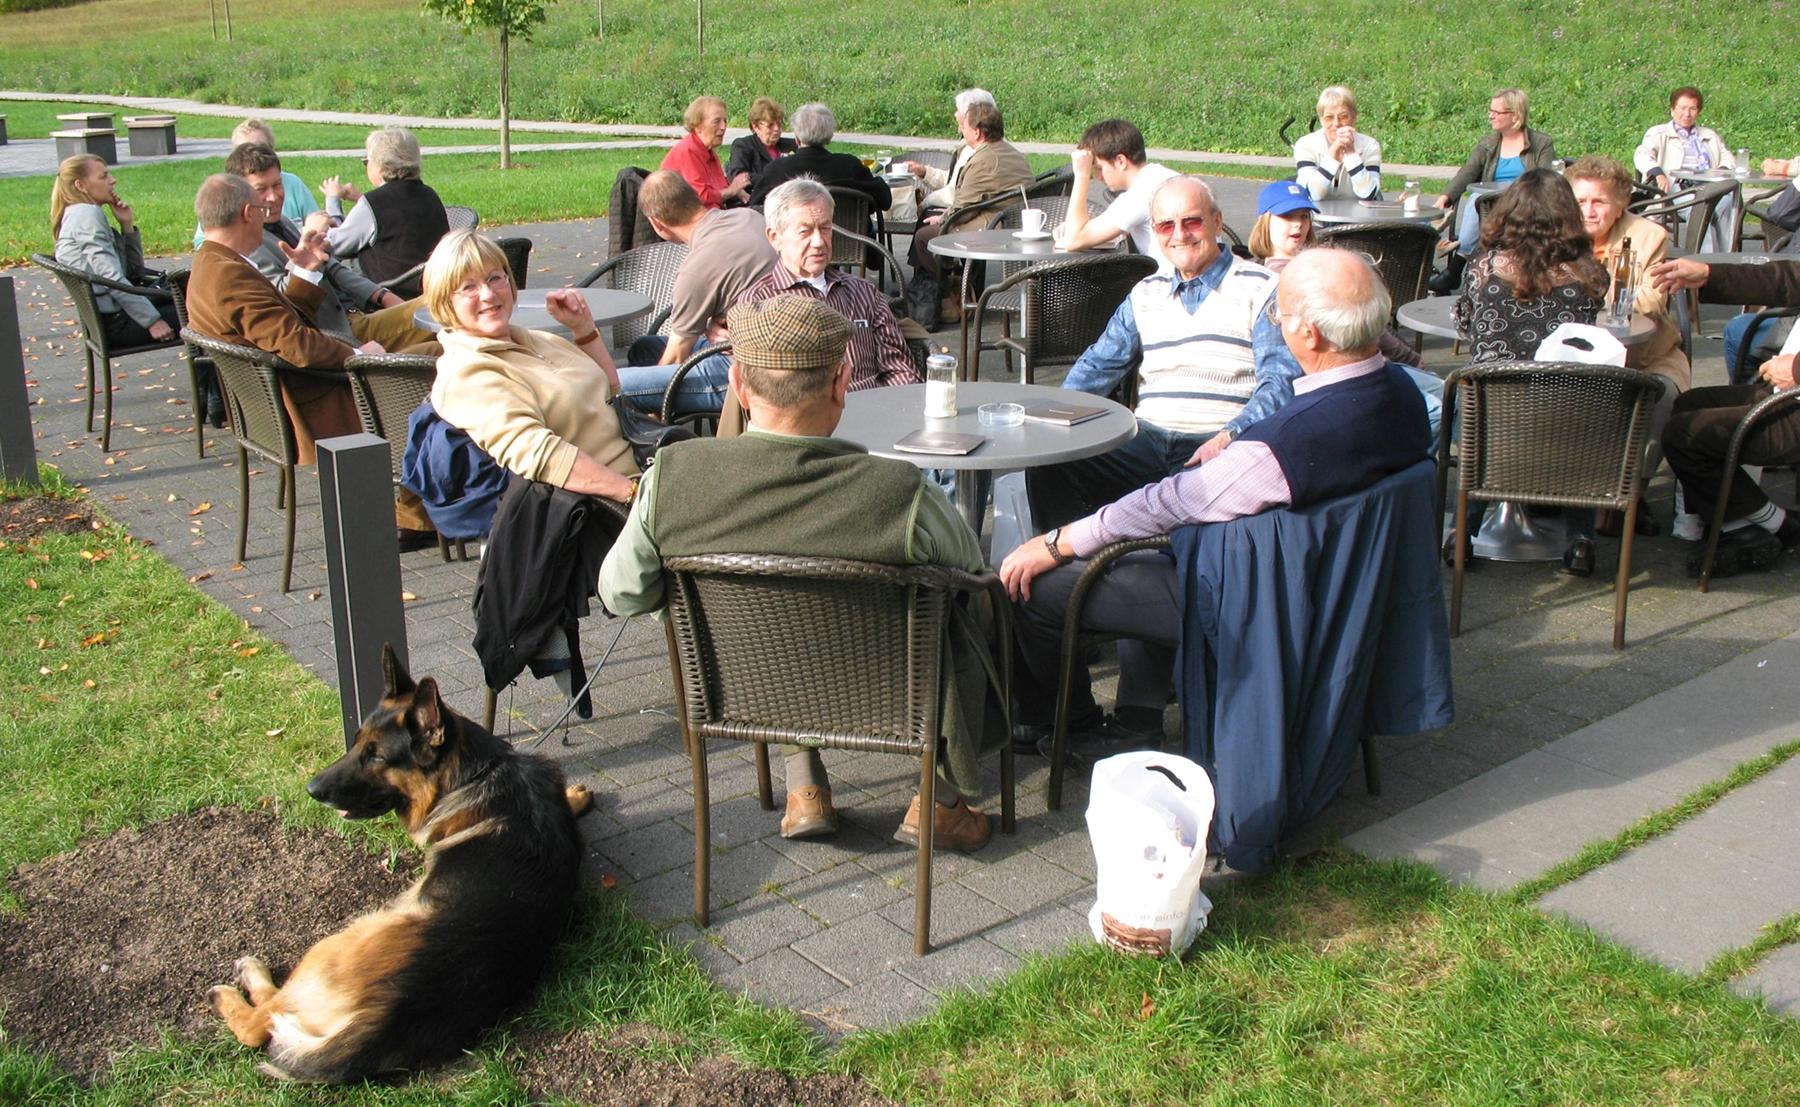 2008_10_08 Waldenbuch, Kaffeepause